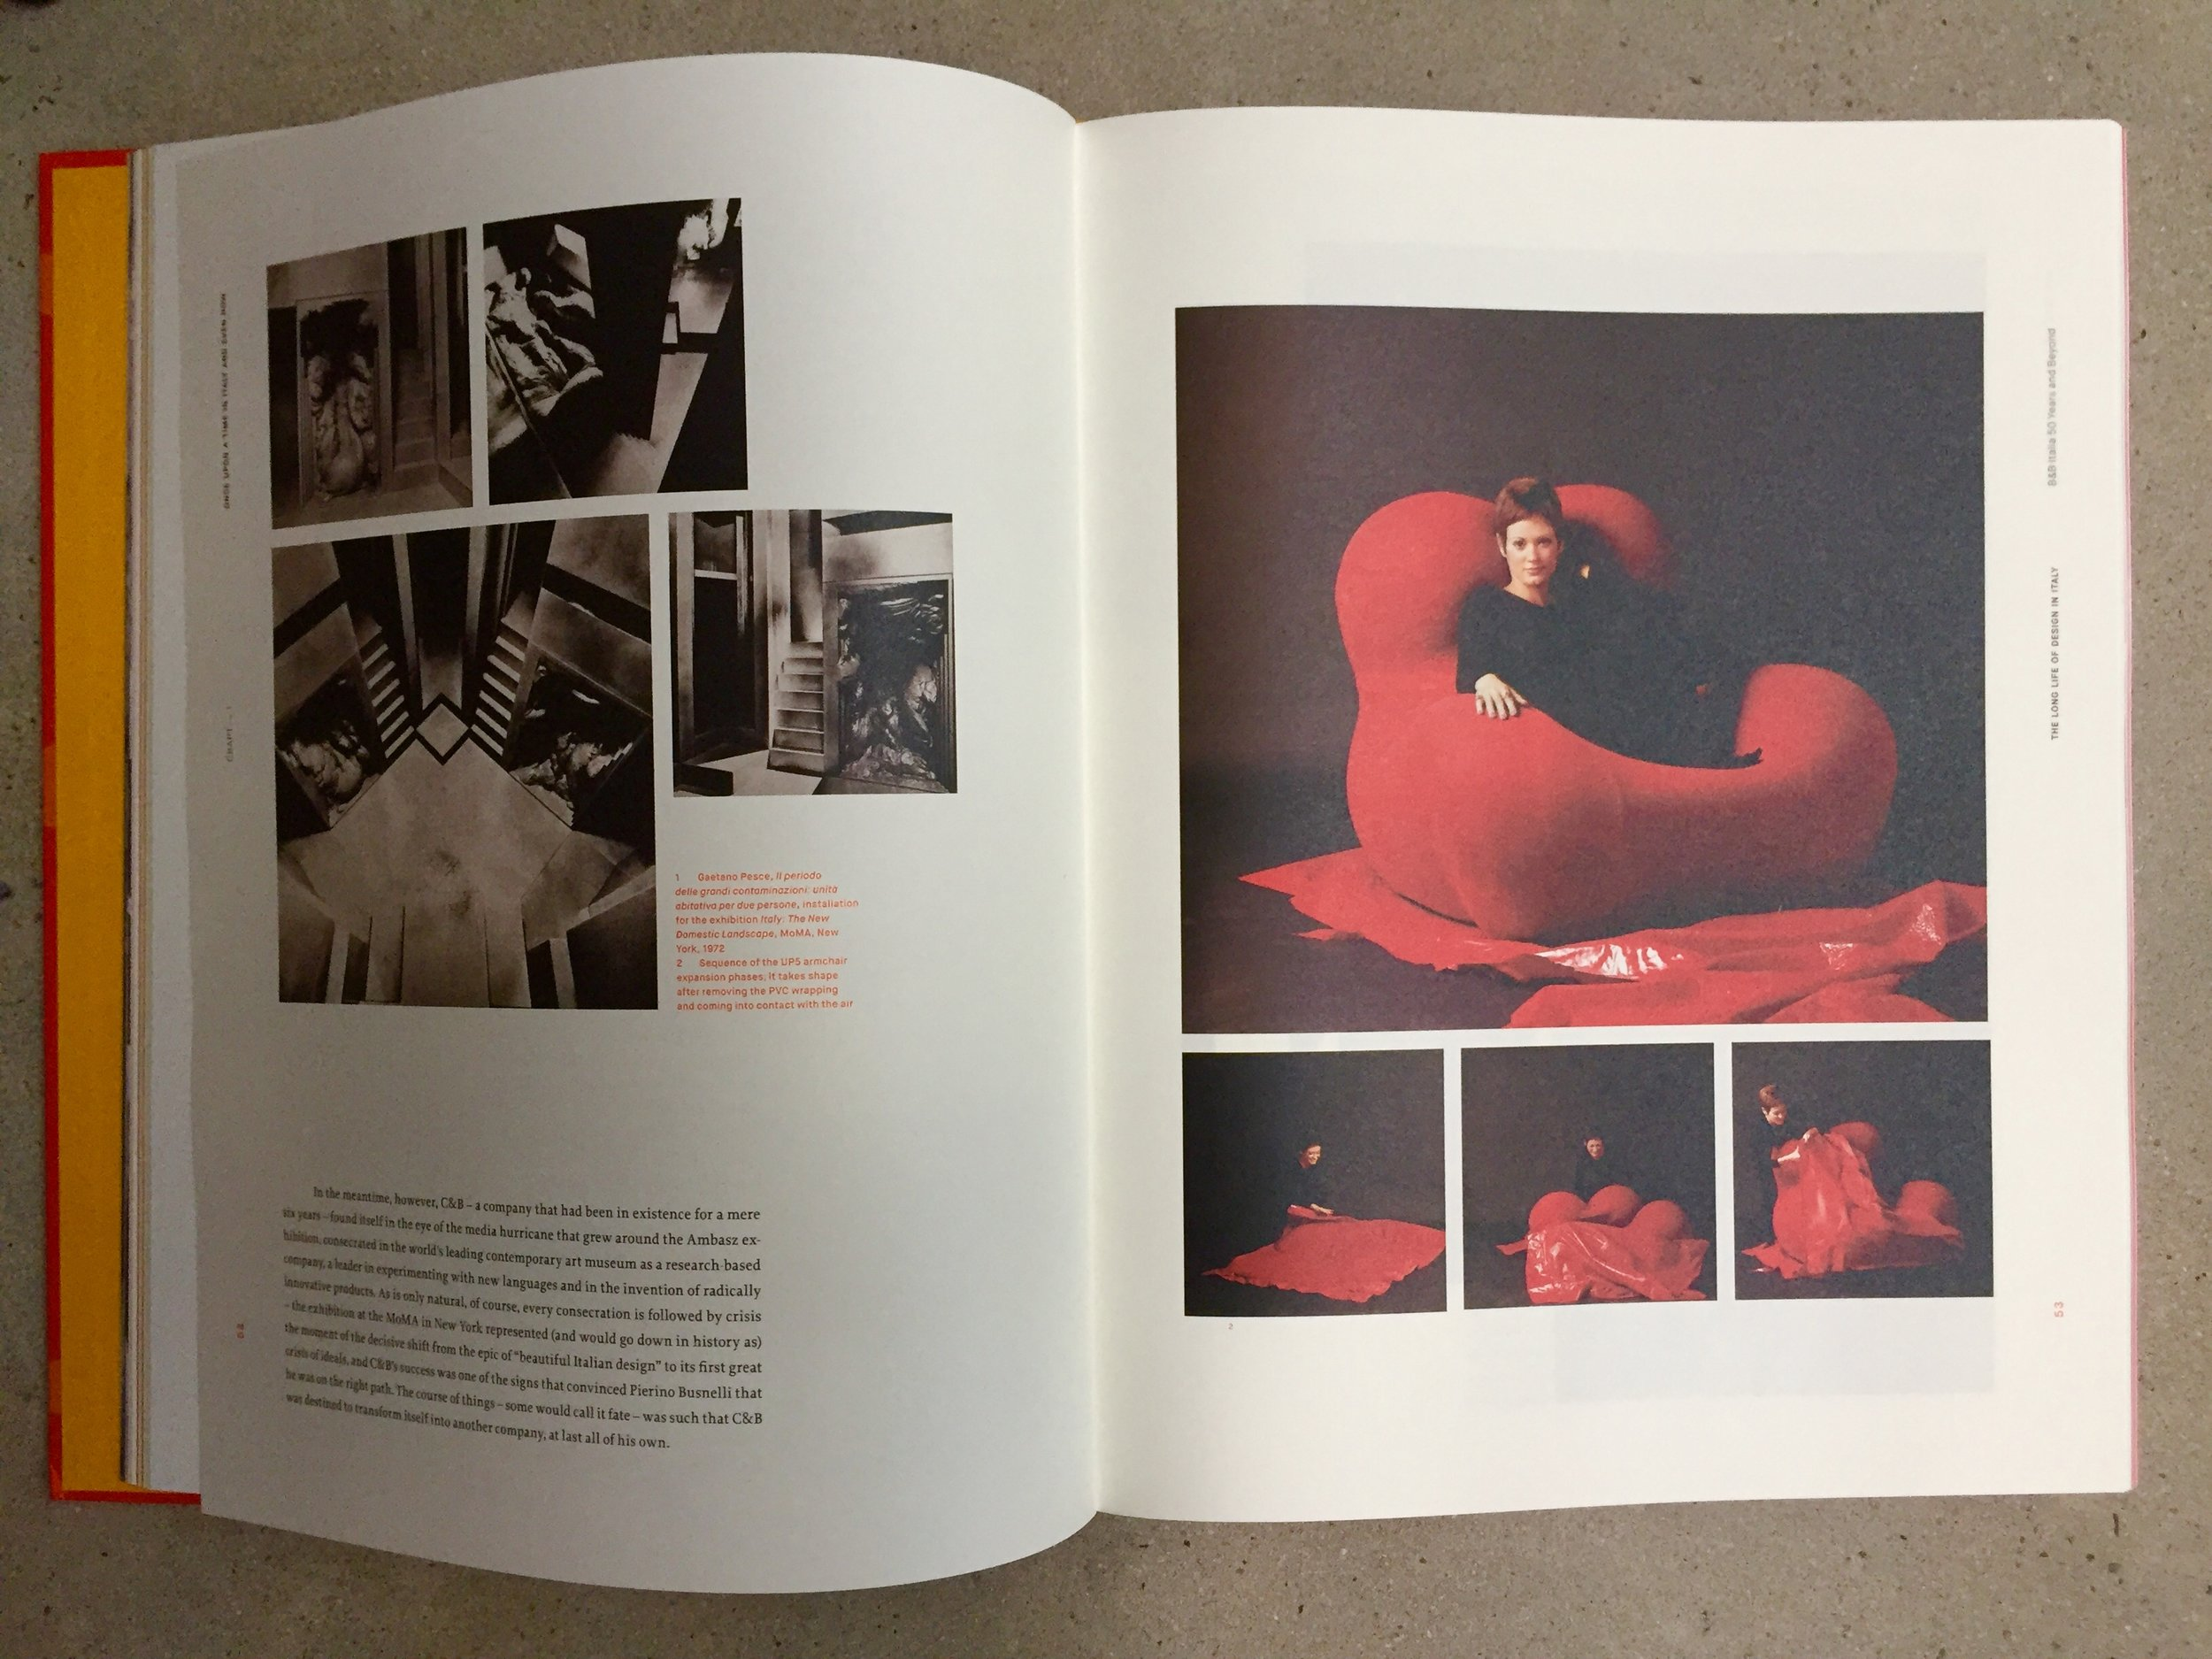 B&B-Italia-Book-2_3275.jpg